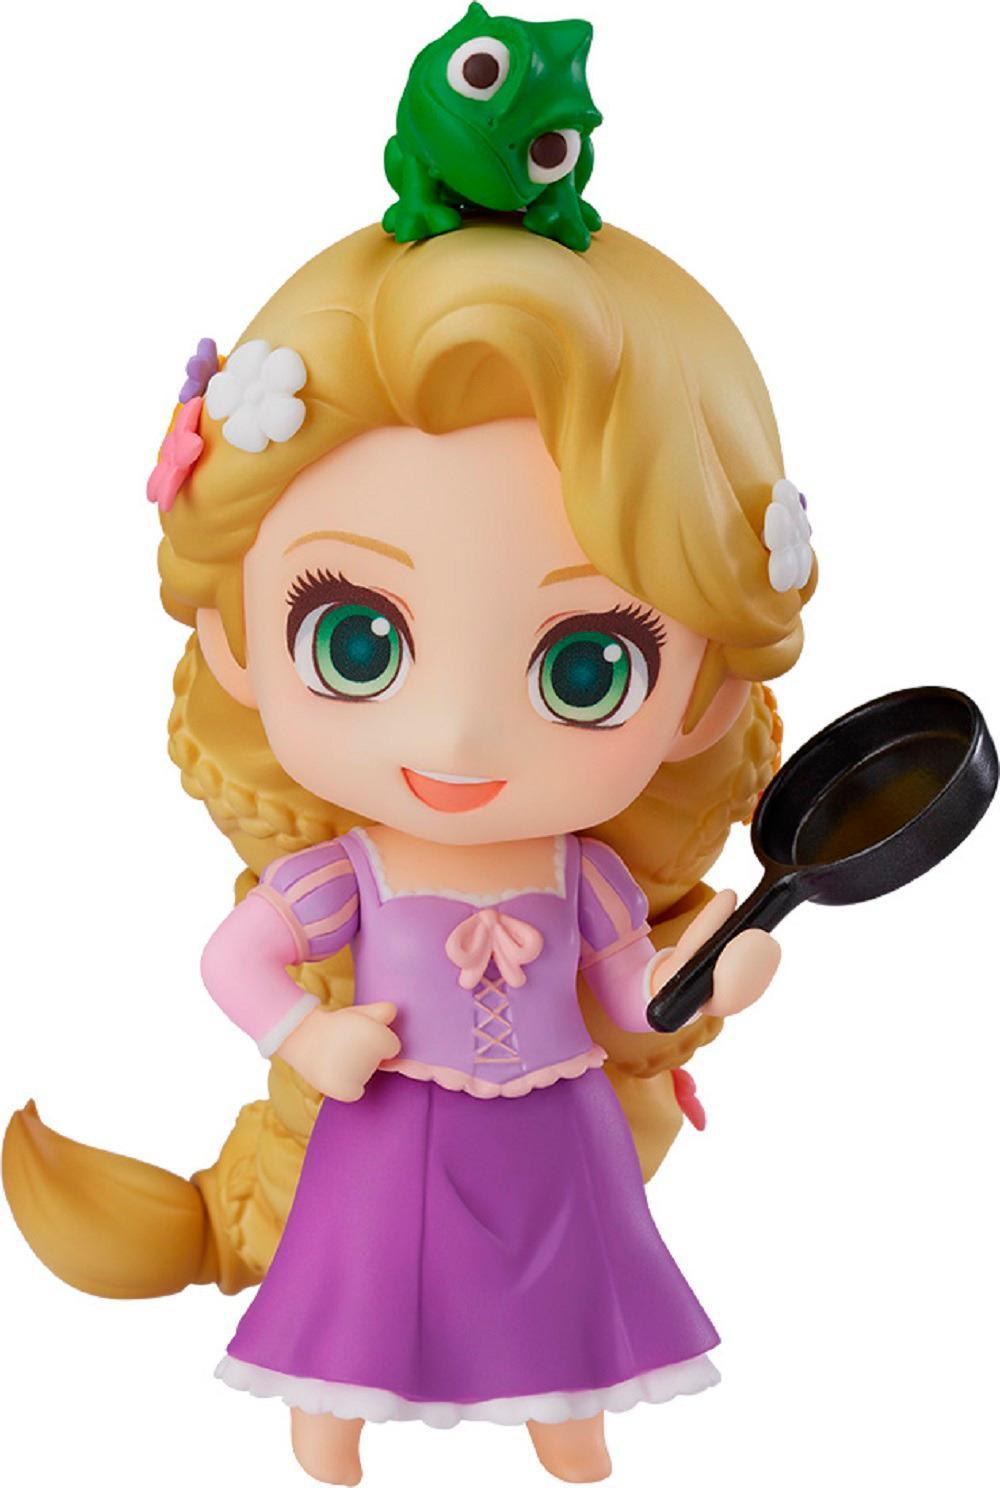 Good Smile Company - Tangled Rapunzel Nendoroid 6028302